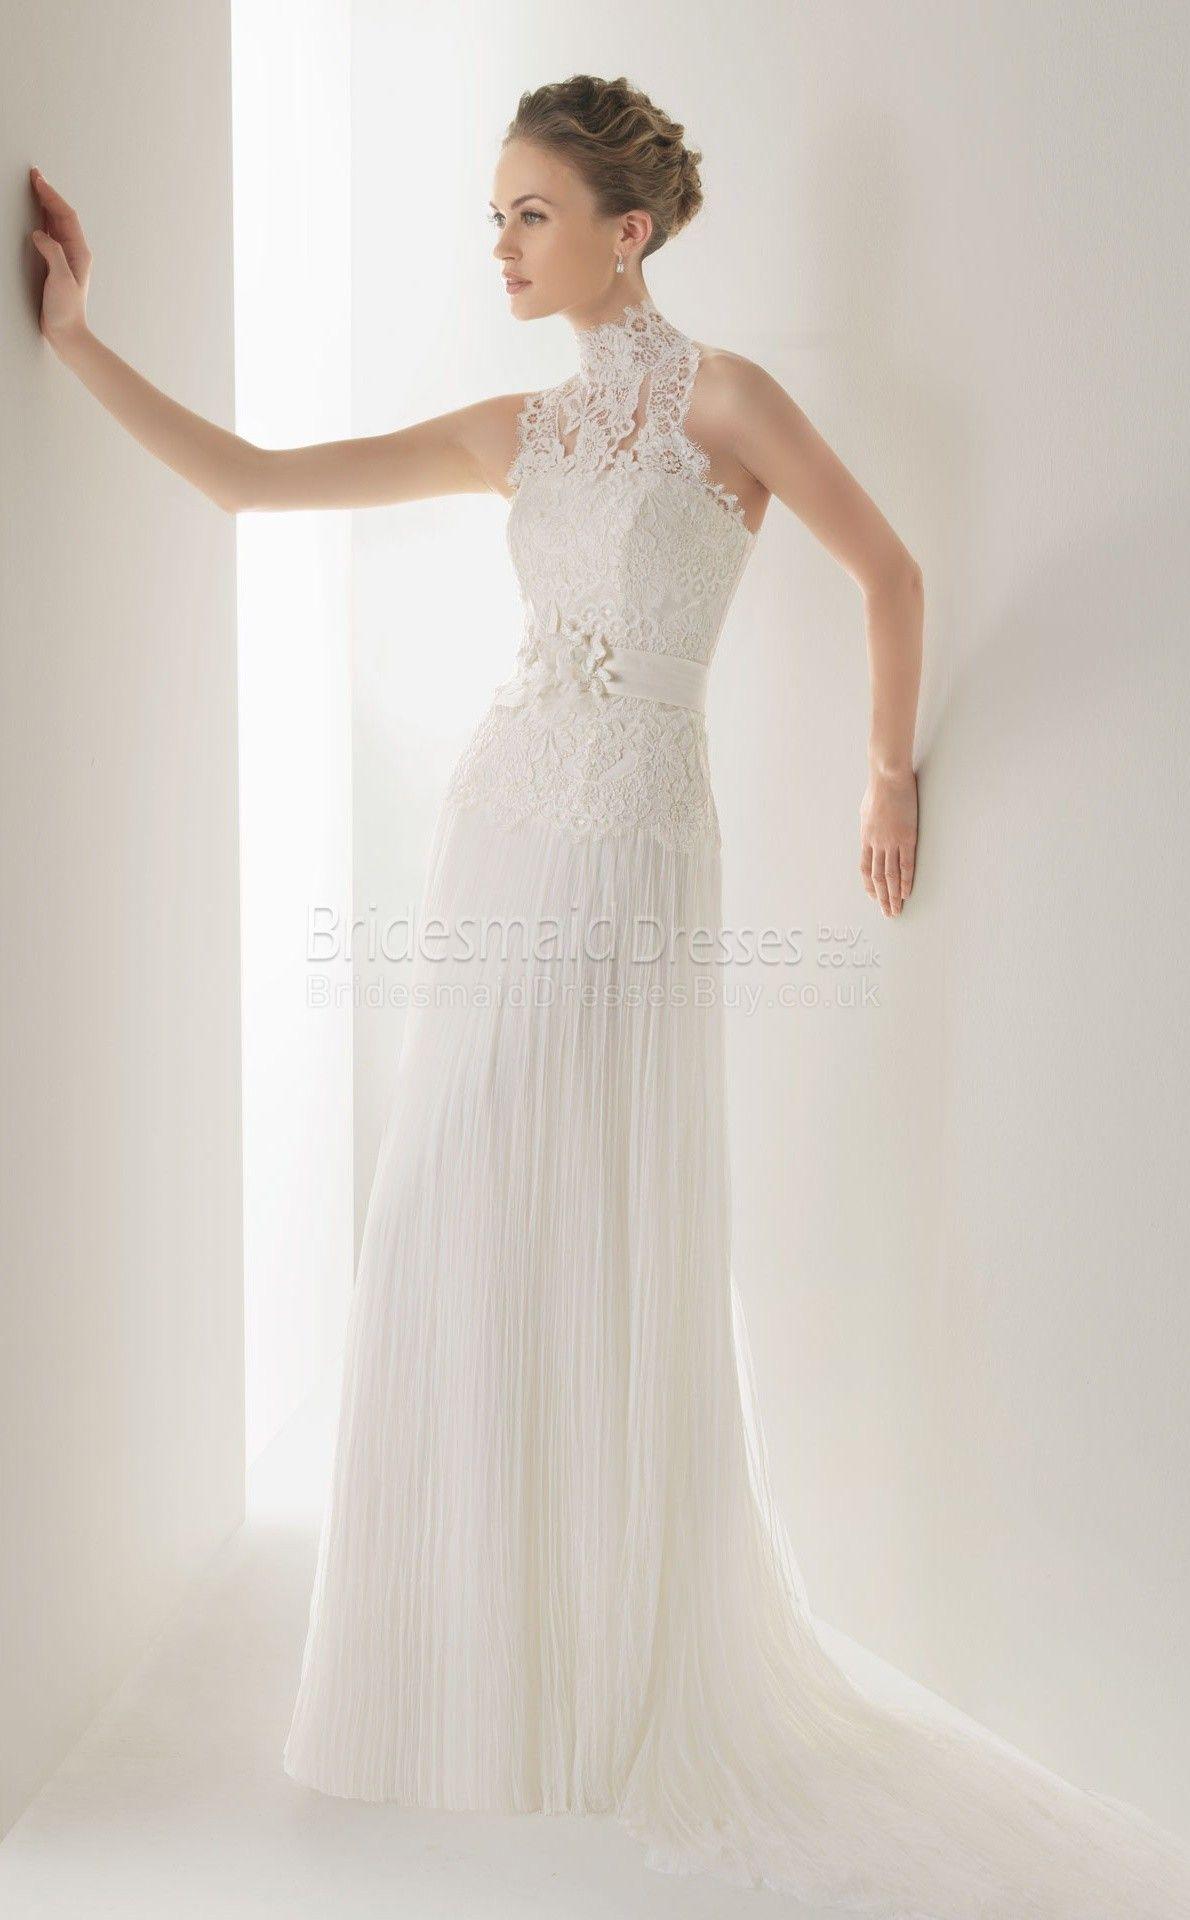 beach wedding dresses,simple wedding dresses | Wedding / Boda ...